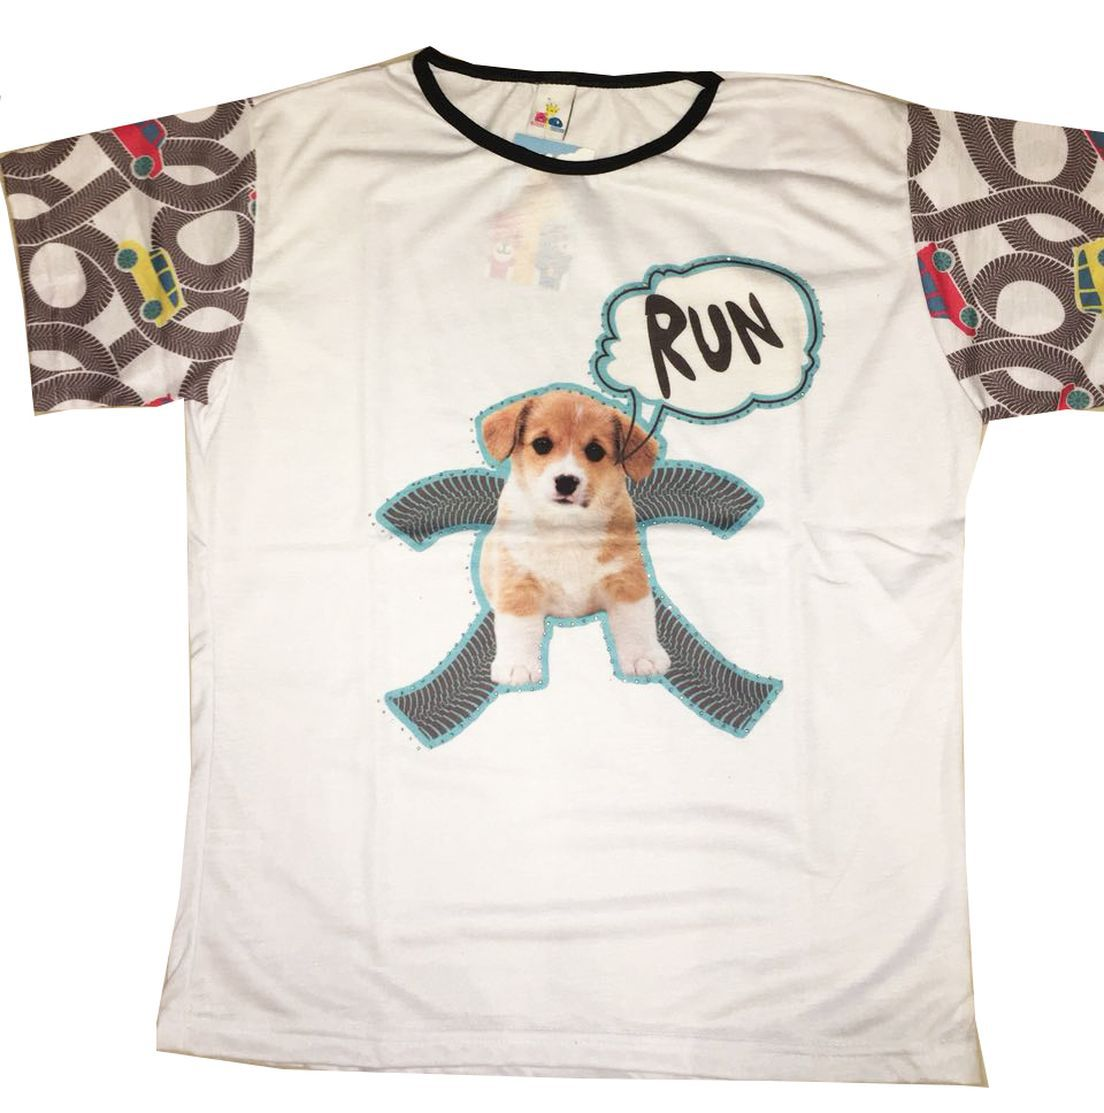 Tal Mãe & Tal Pet – Run Cachorrinho  - Shoppinho Animal